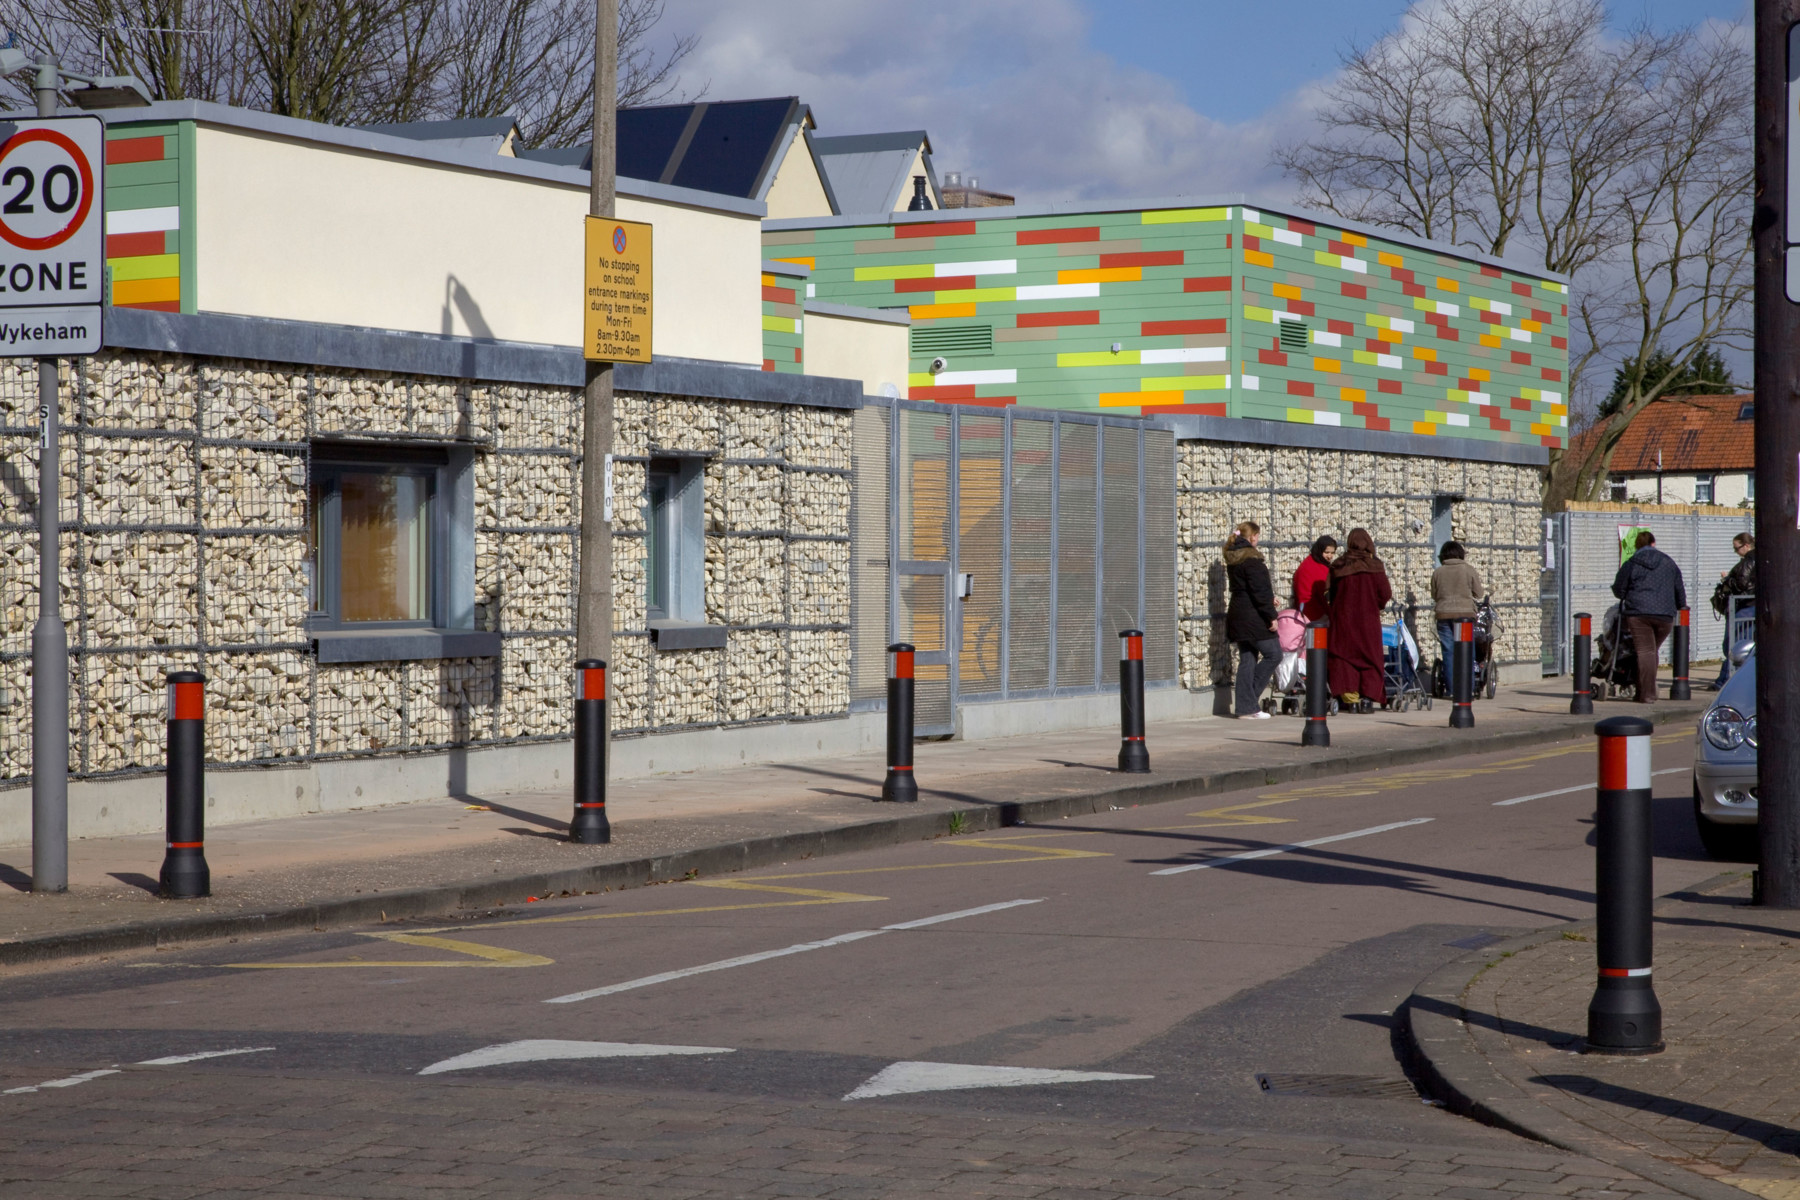 Sarah-Wigglesworth-Architects Heathfield External Street View 3600